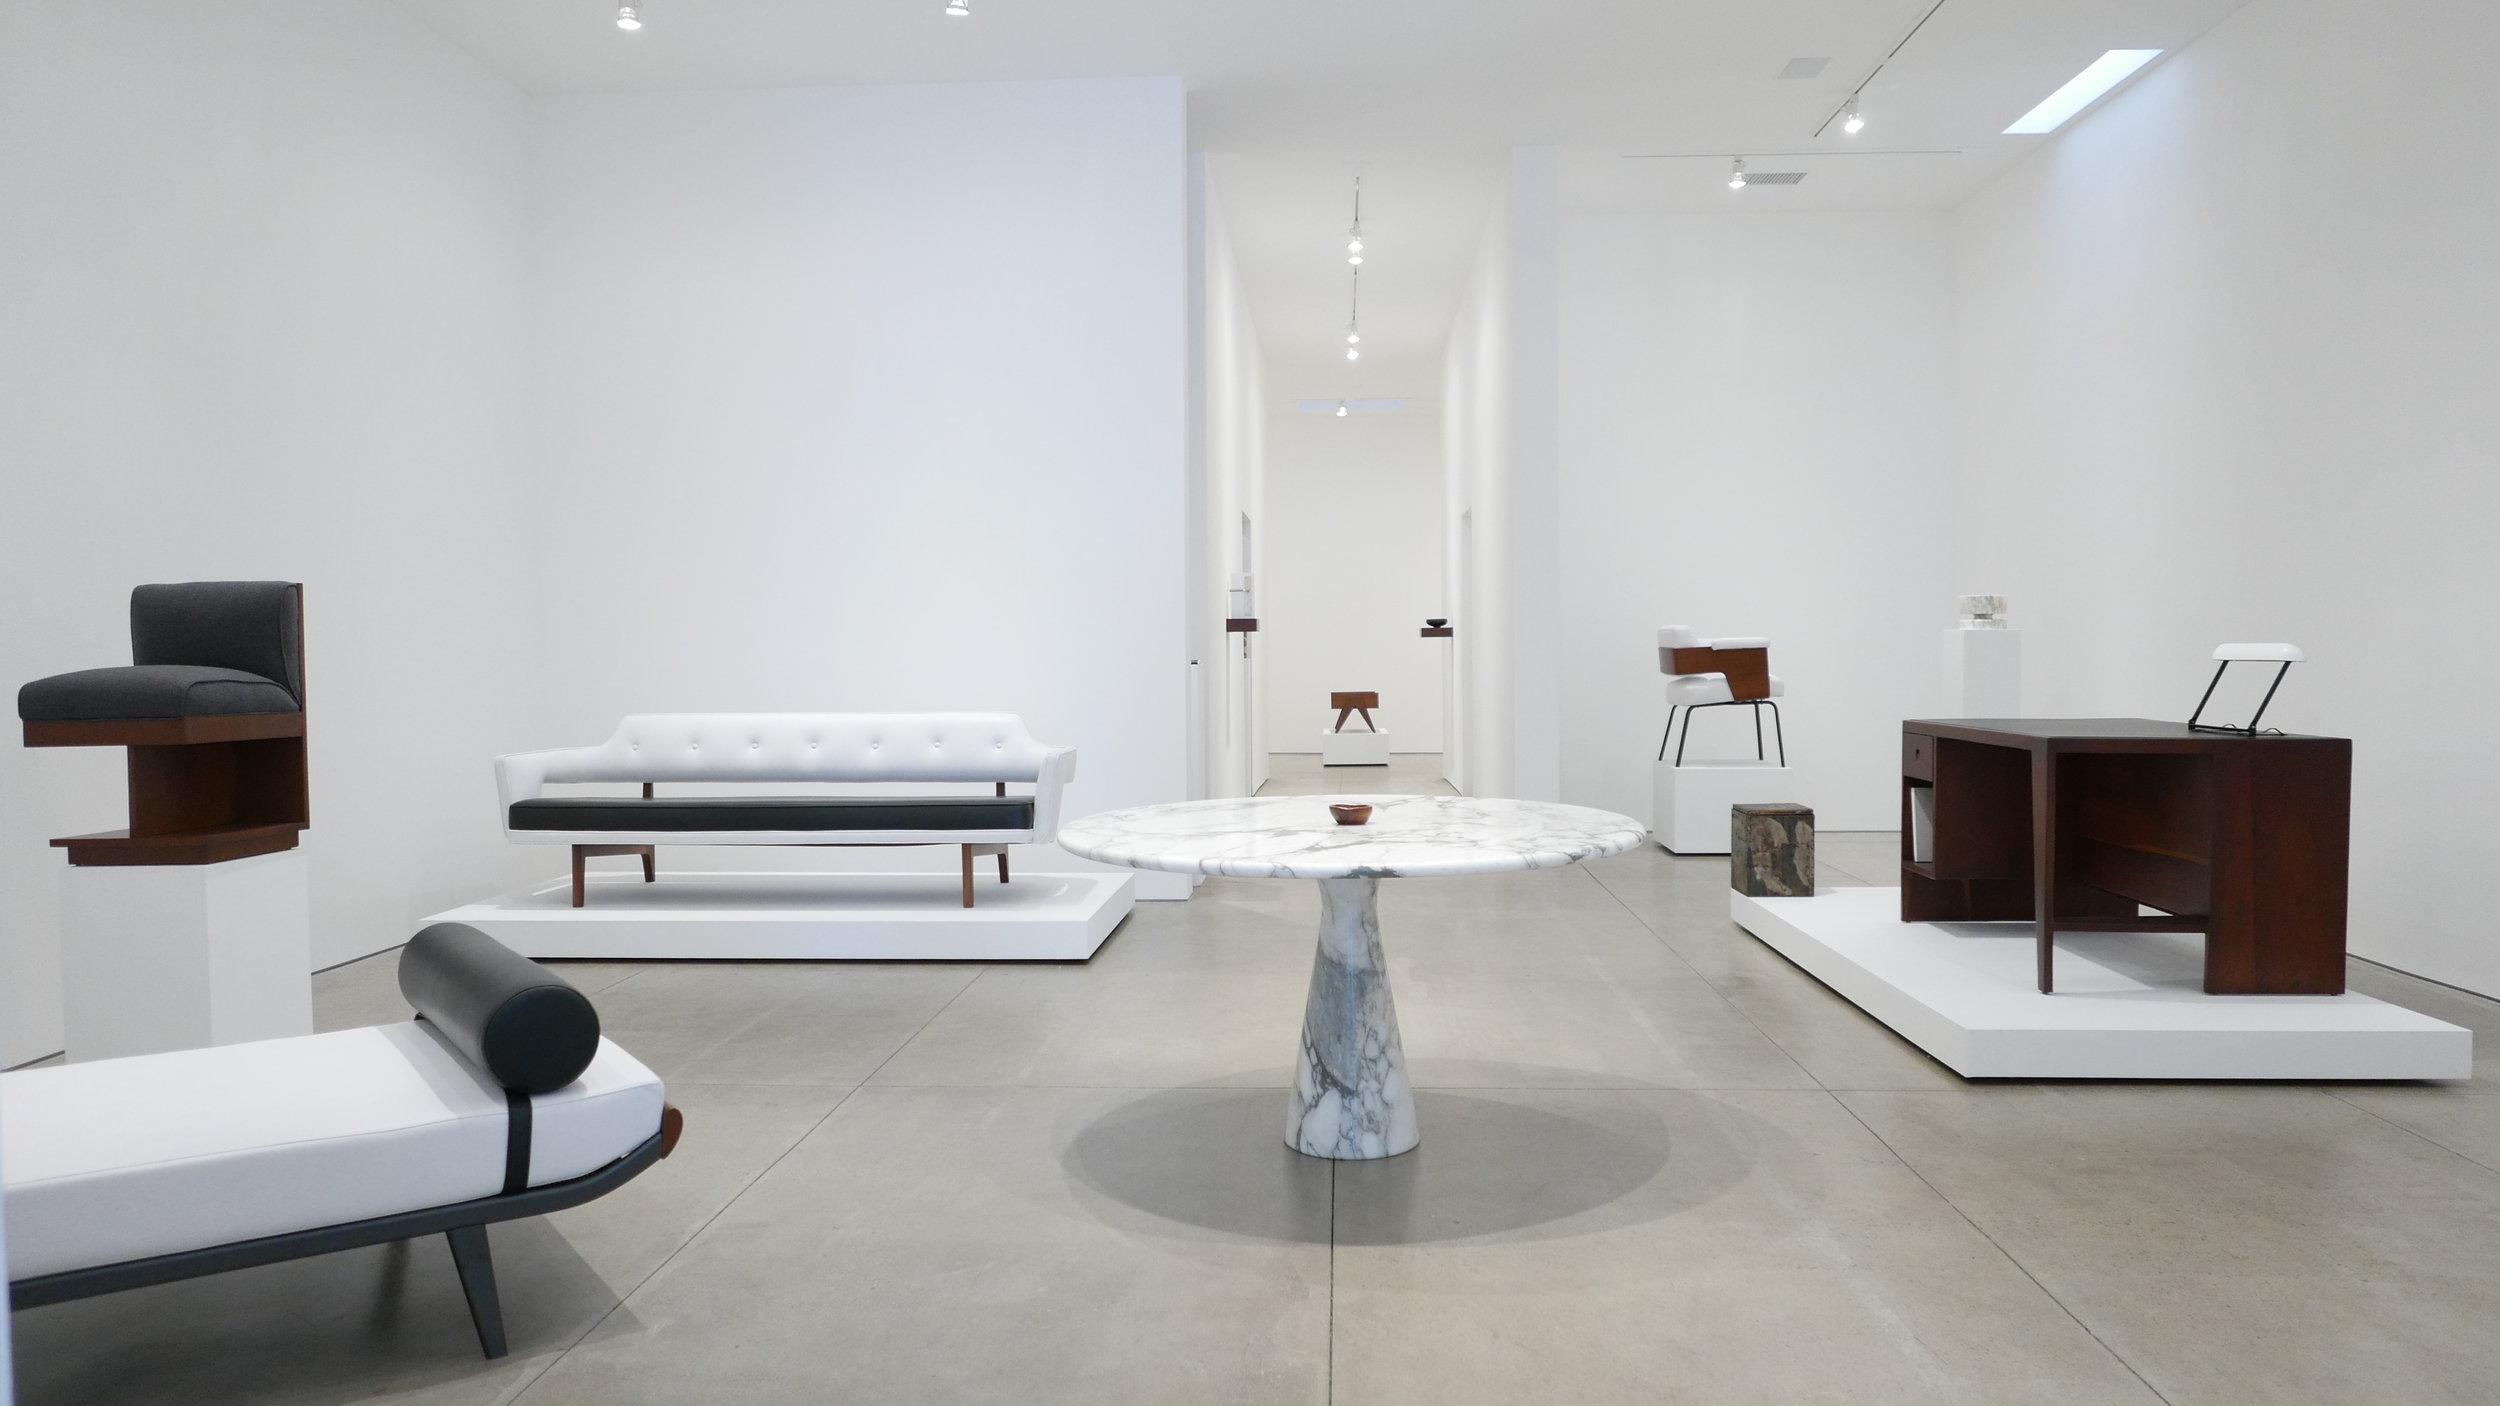 'The Tendency of the Moment - International Design, The Bauhaus Through Modern', Peter Blake Gallery, 2016, Installation View_7.JPG